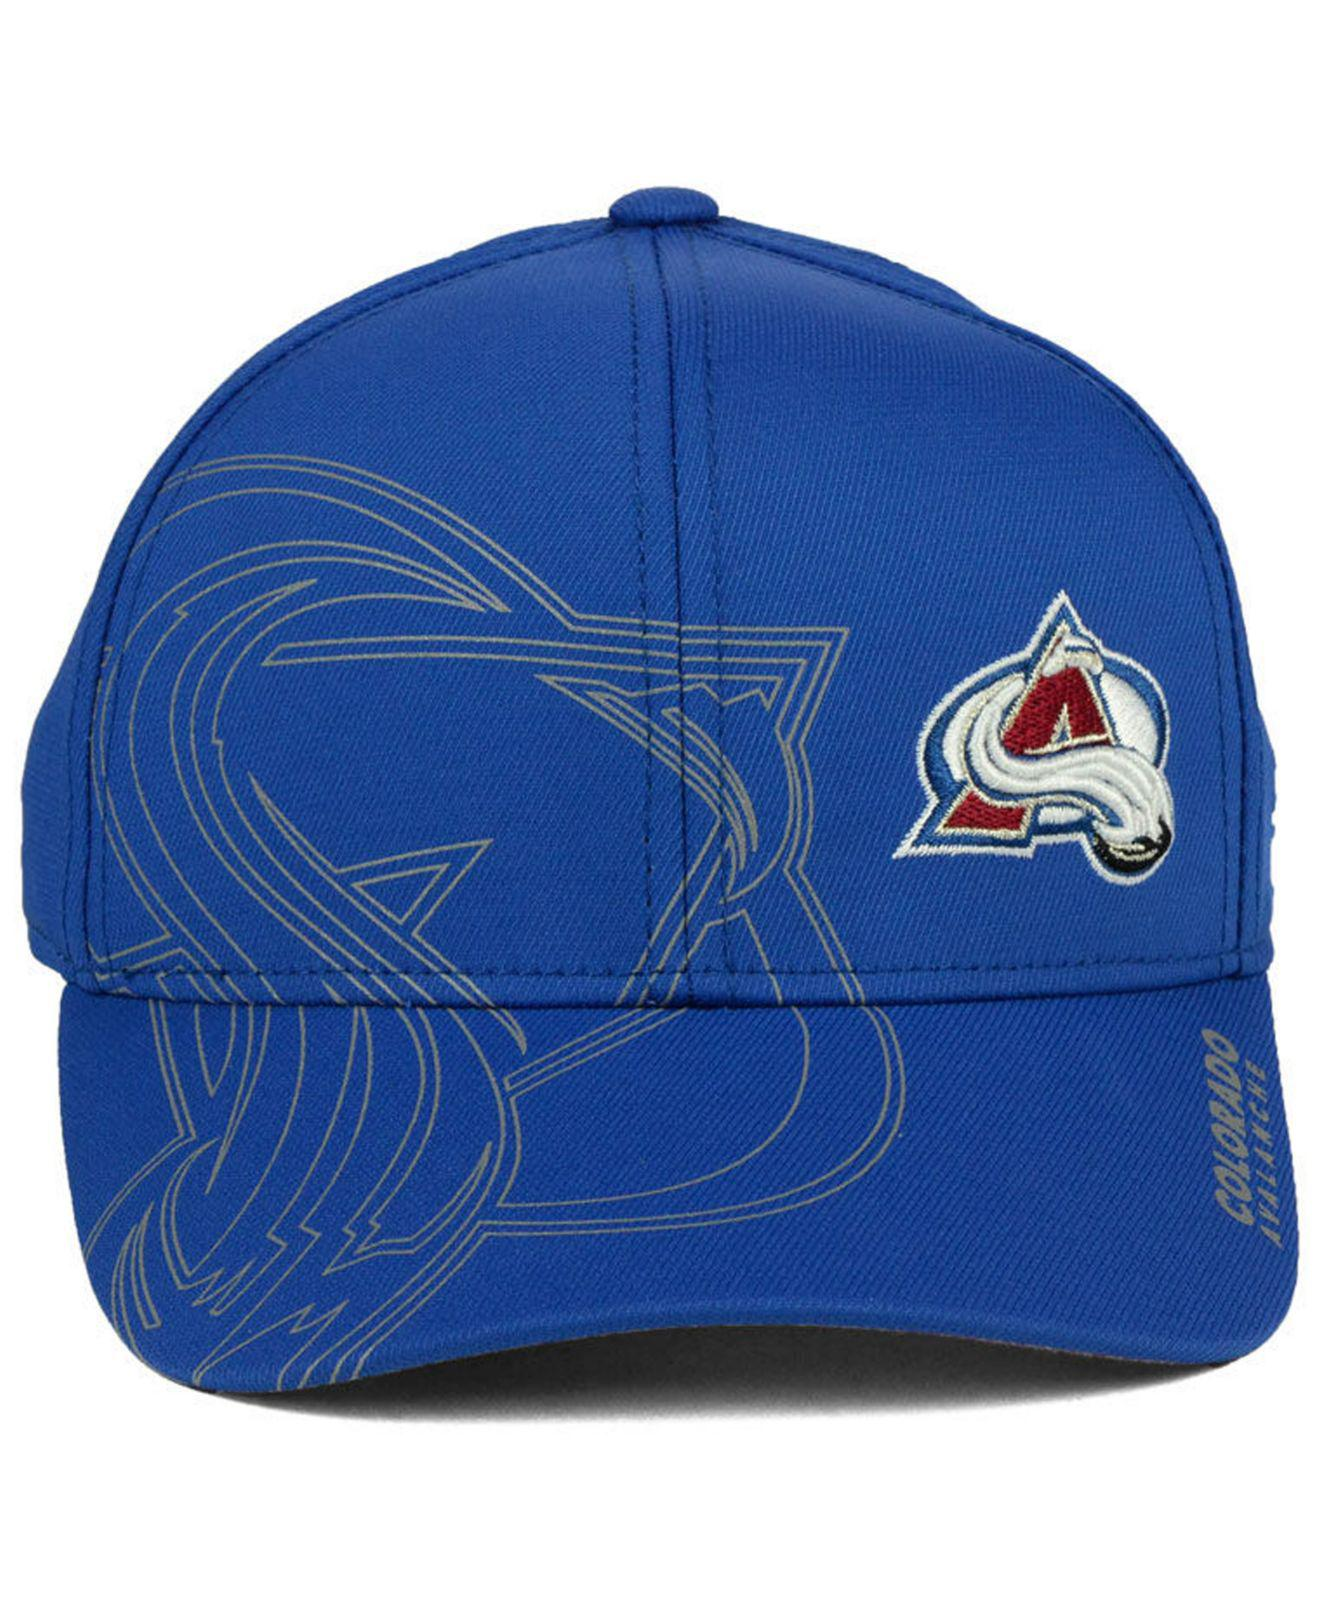 d51973cd ... discount lyst adidas colorado avalanche 2nd season flex cap in blue for  men 3cf53 b561a